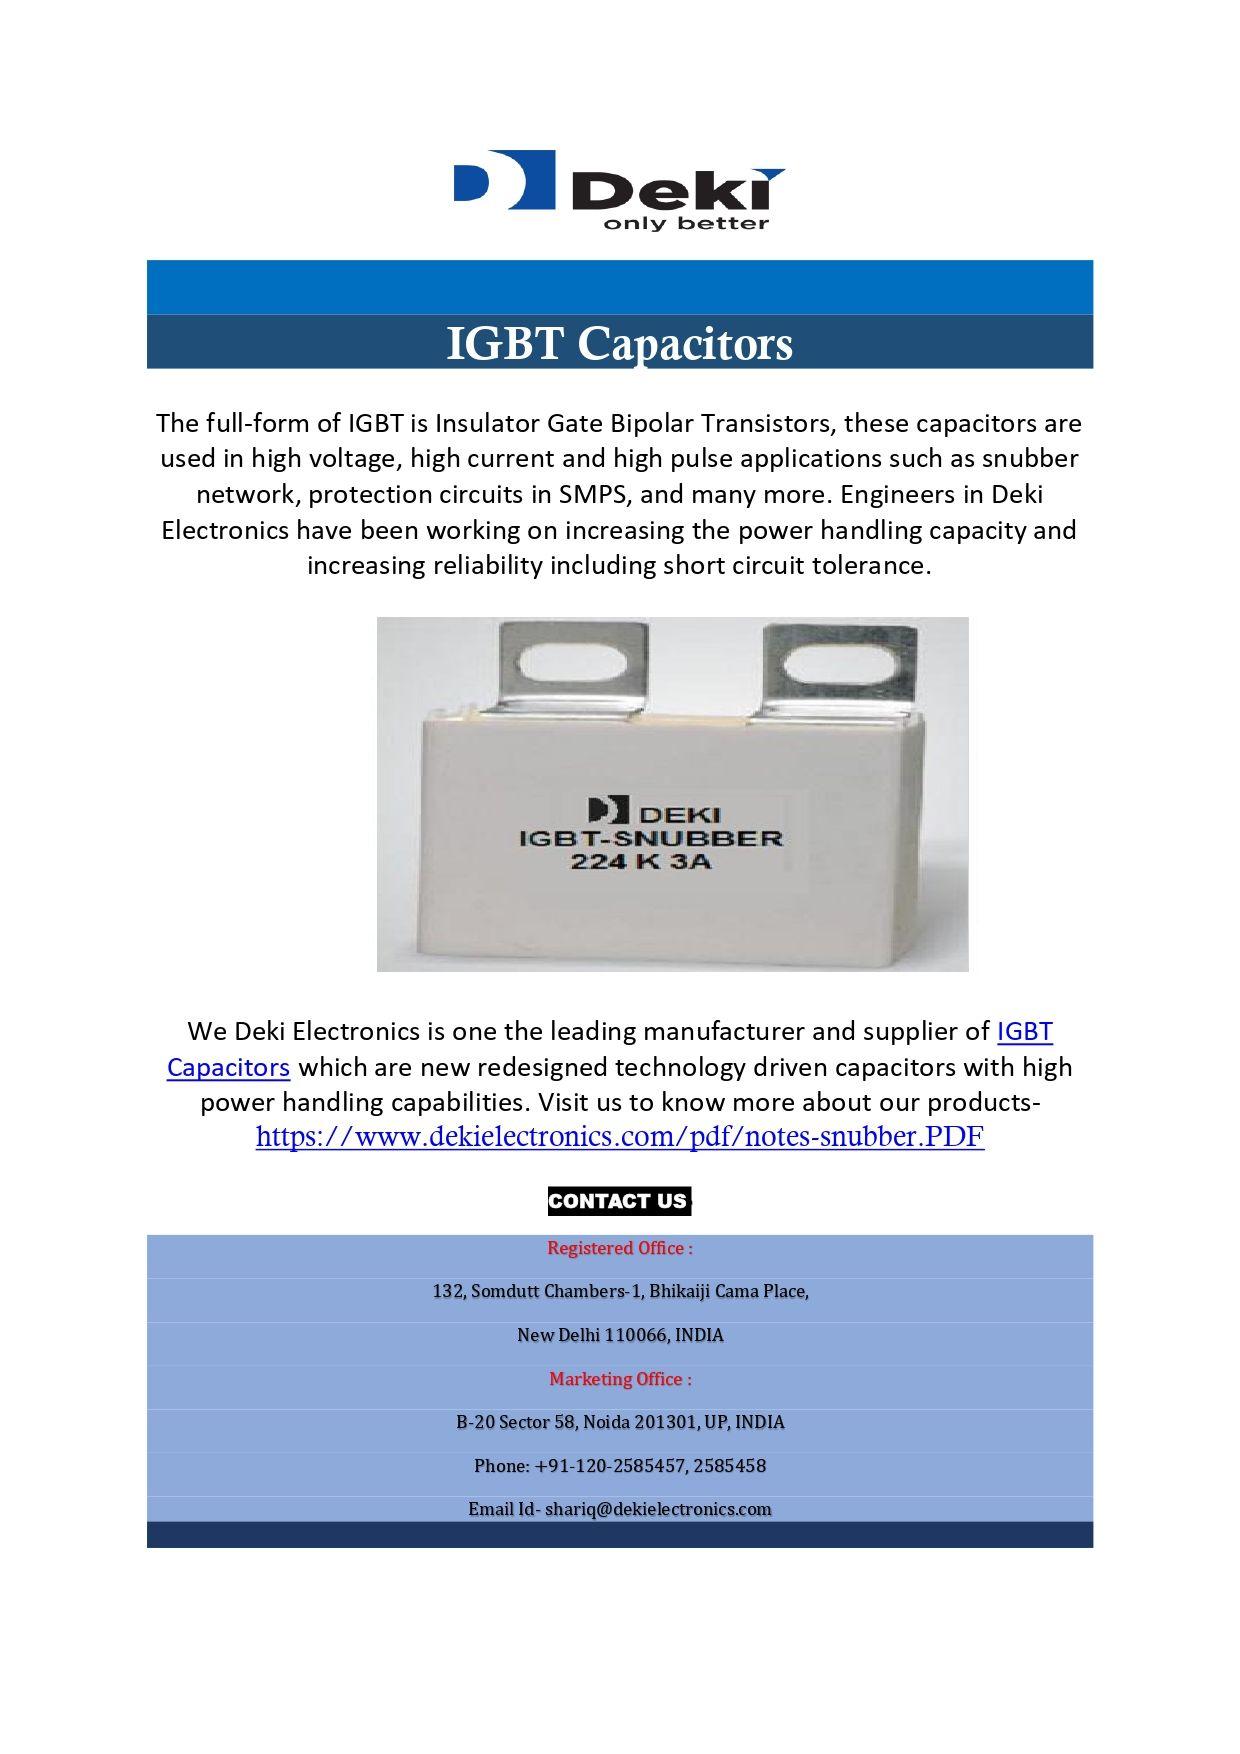 Pin On Igbt Capacitors